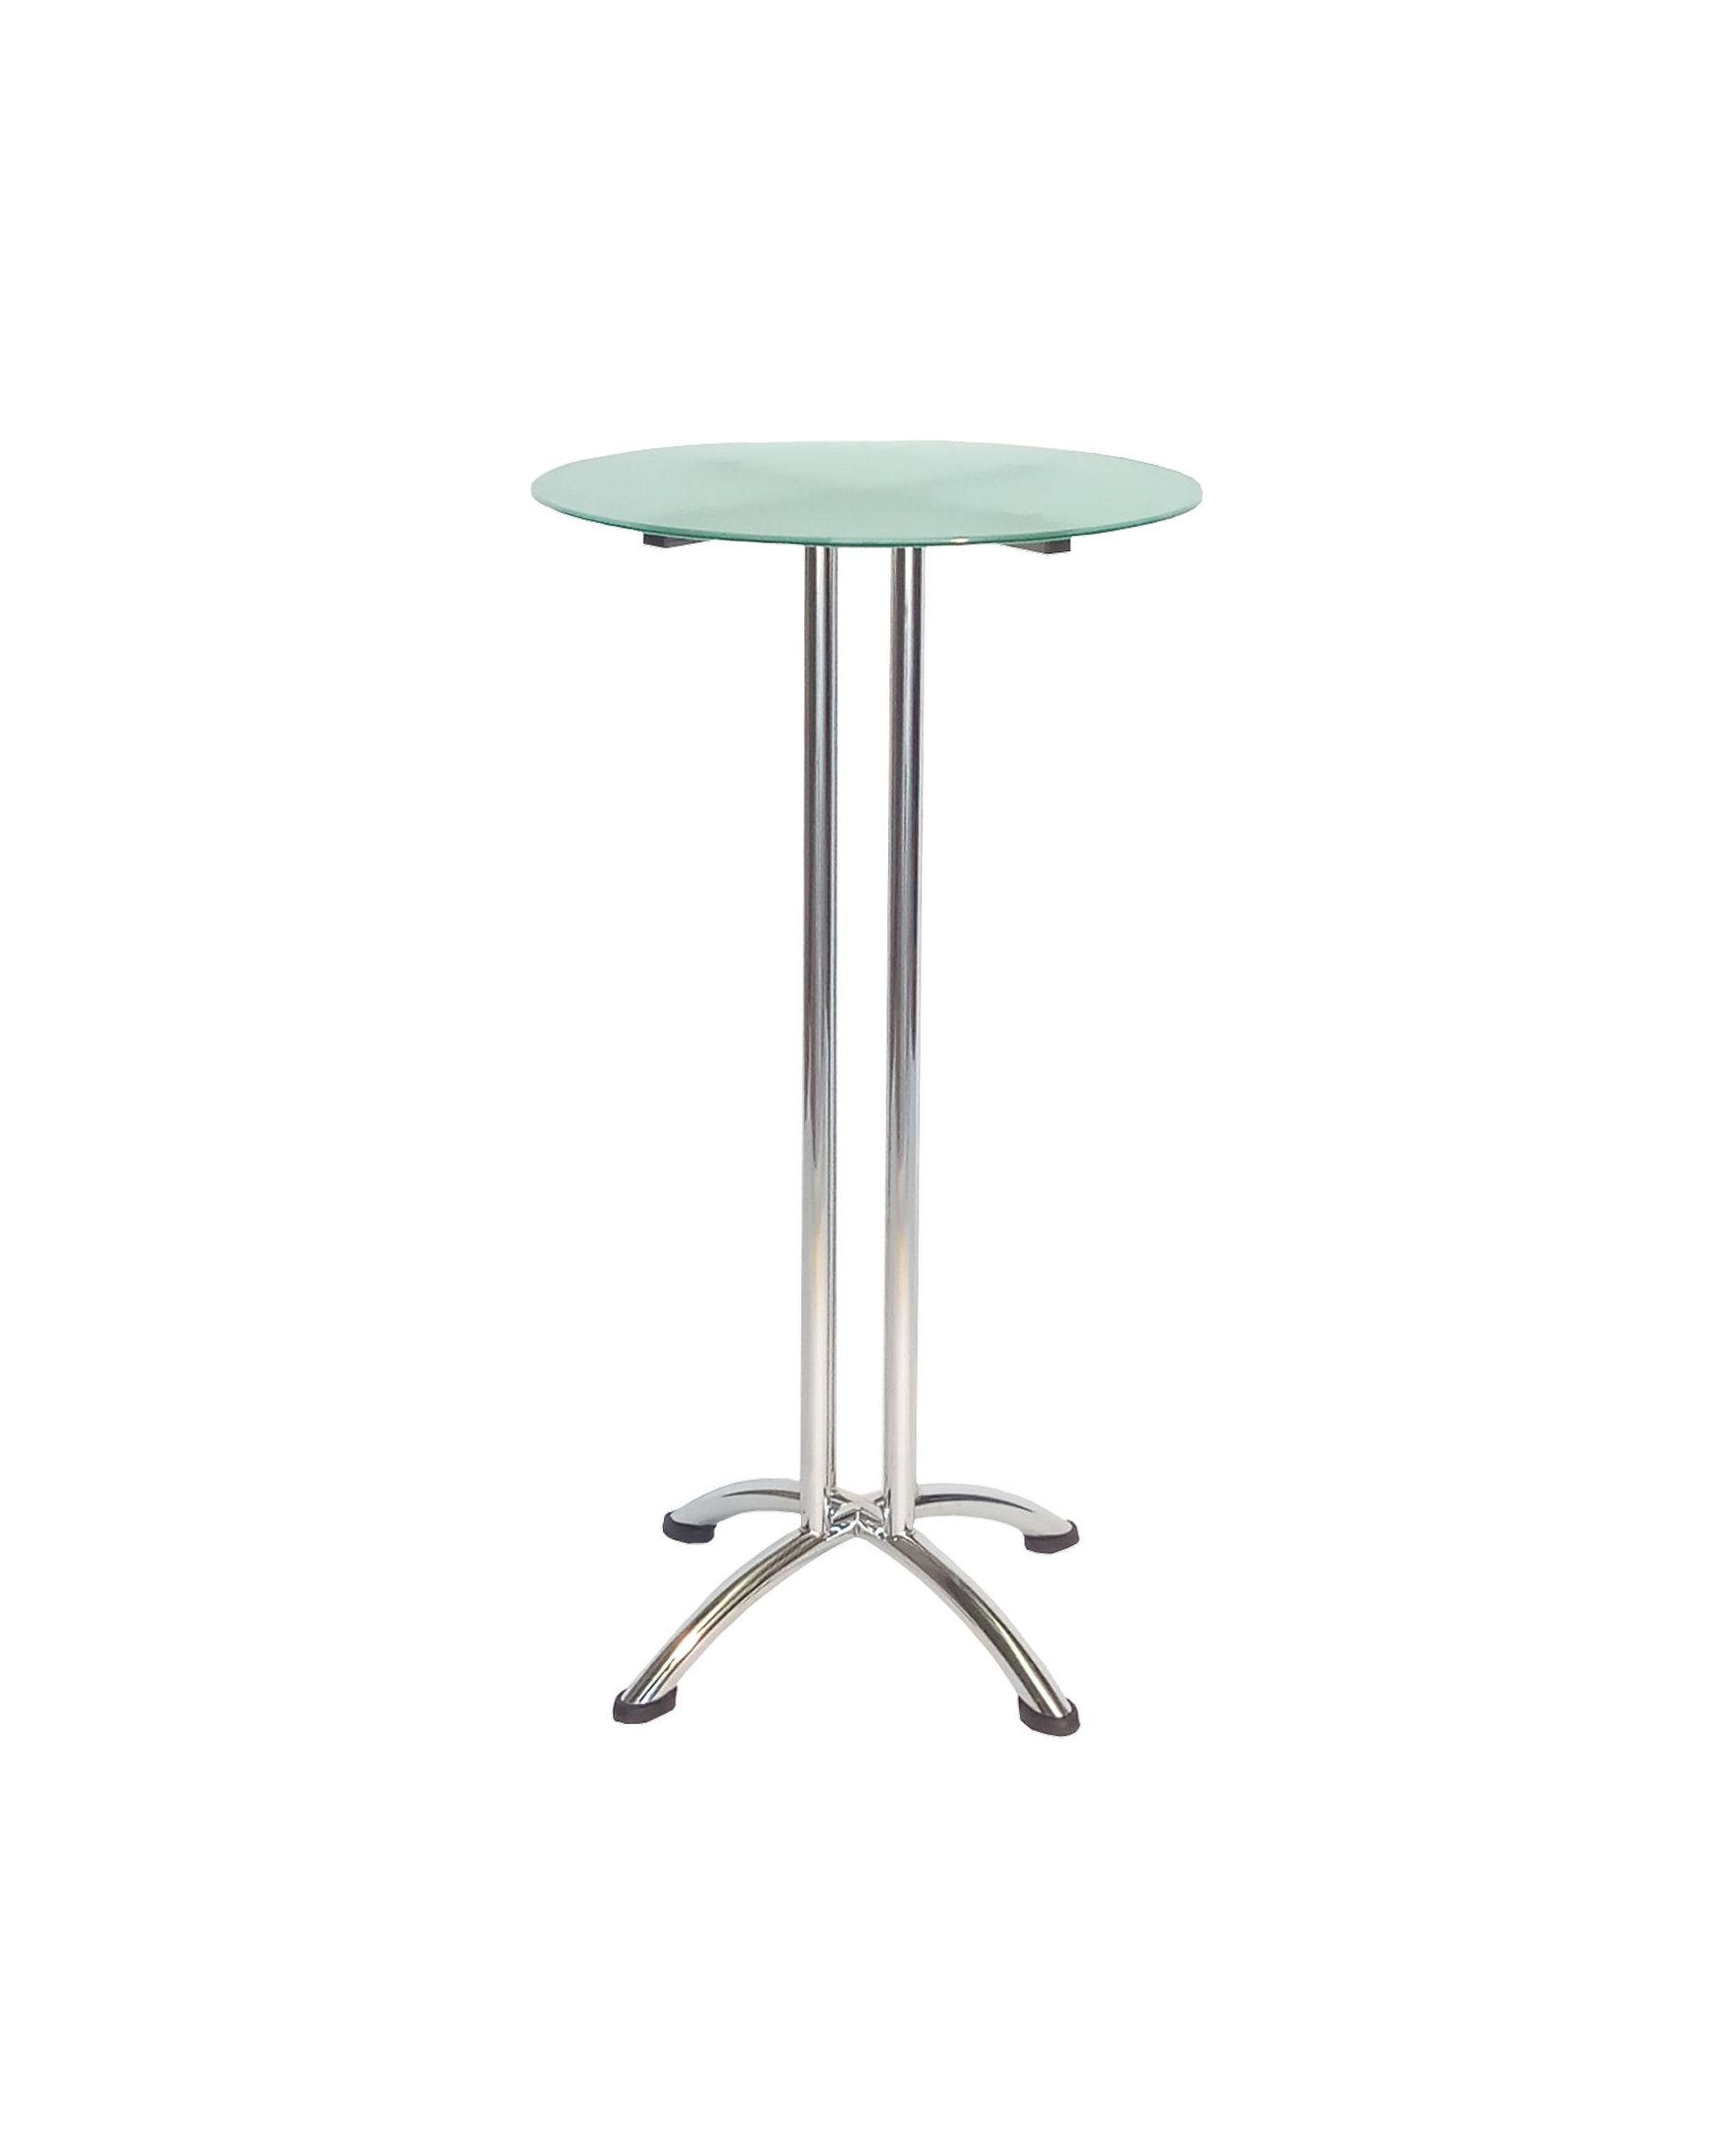 Ordesa Cristal: Alquiler de mobiliario de Stuhl Ibérica Alquiler de Mobiliario